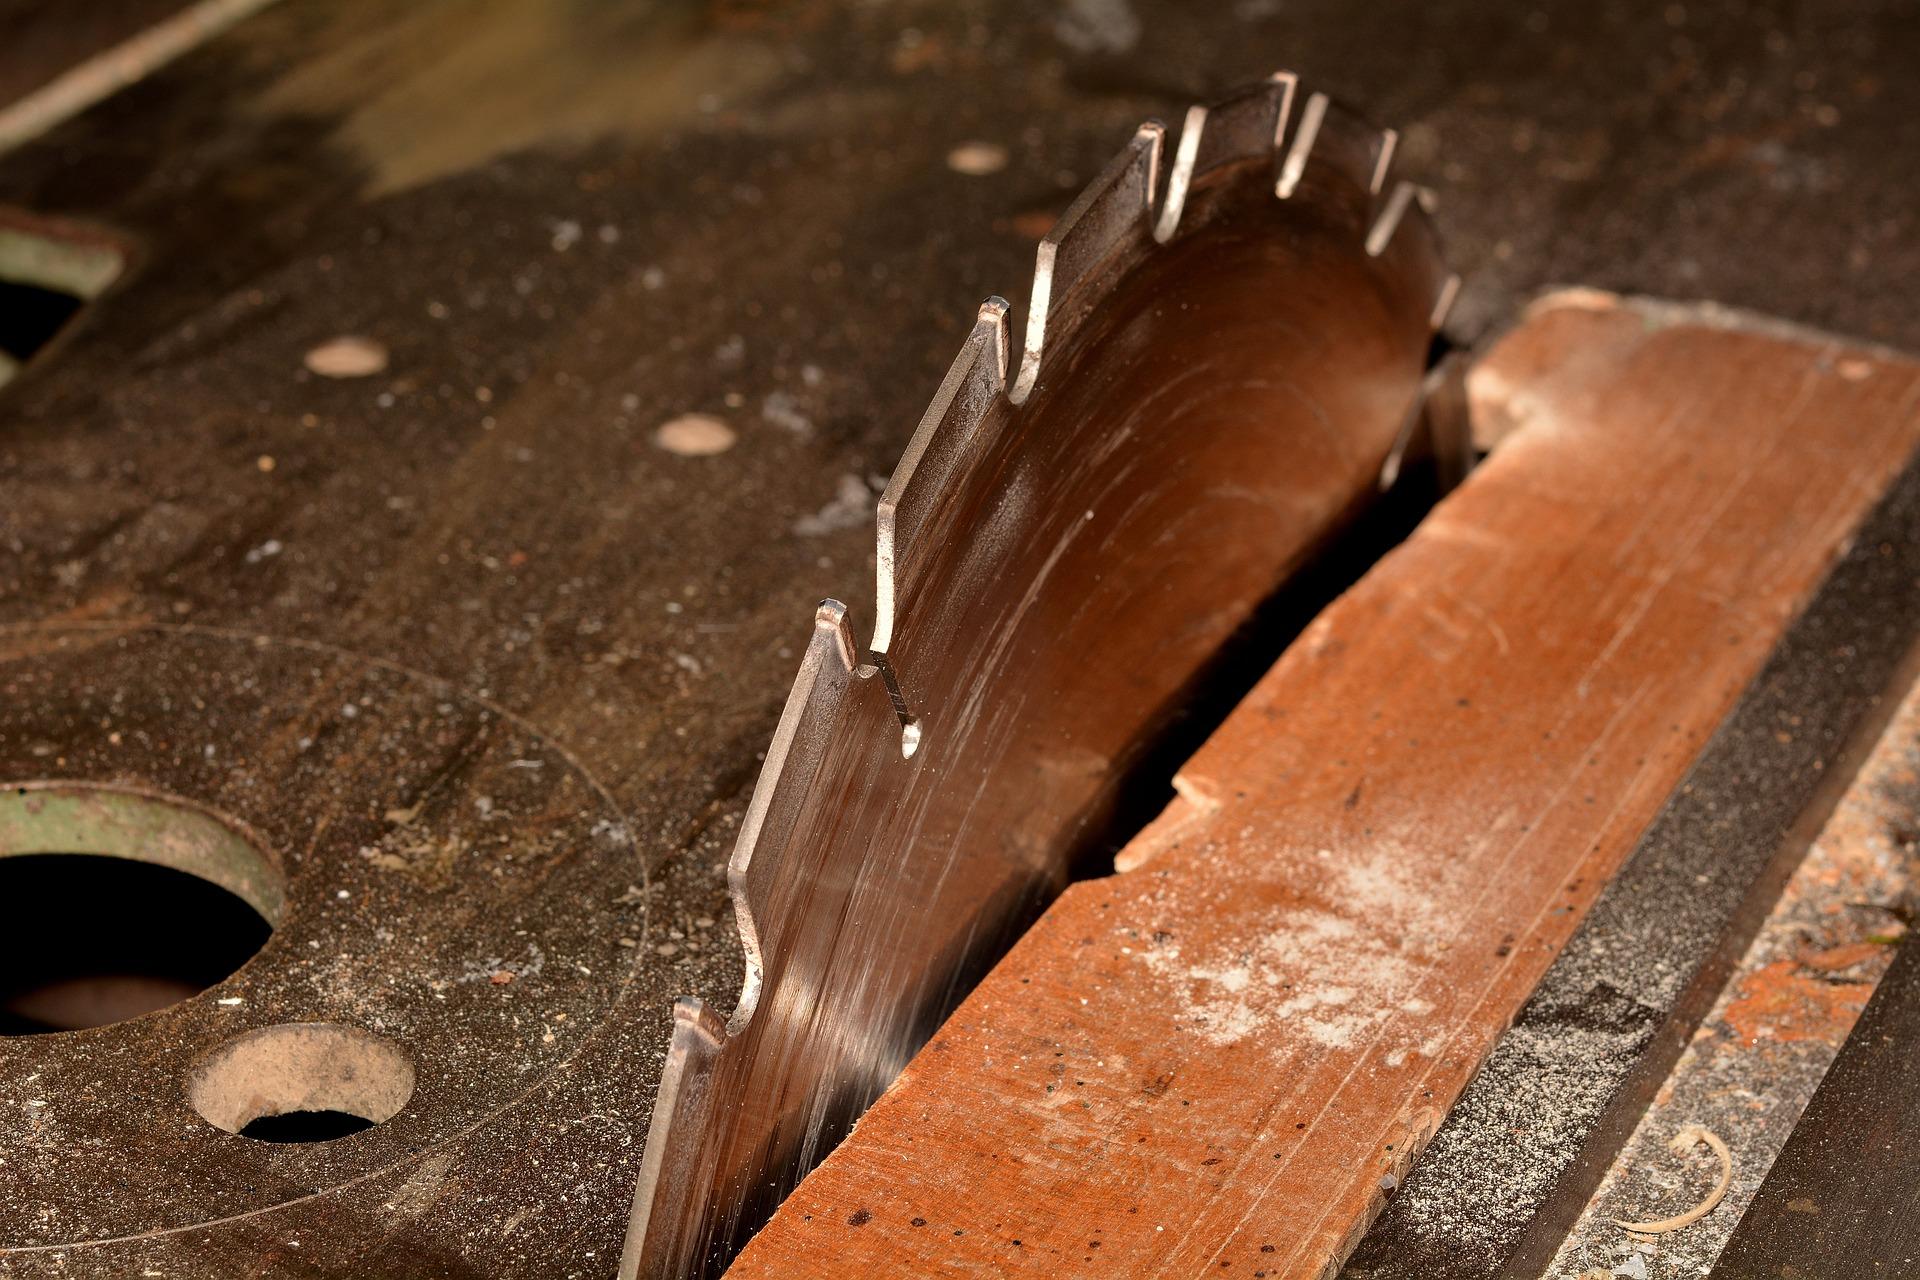 Factors to Consider When Choosing Bandsaws